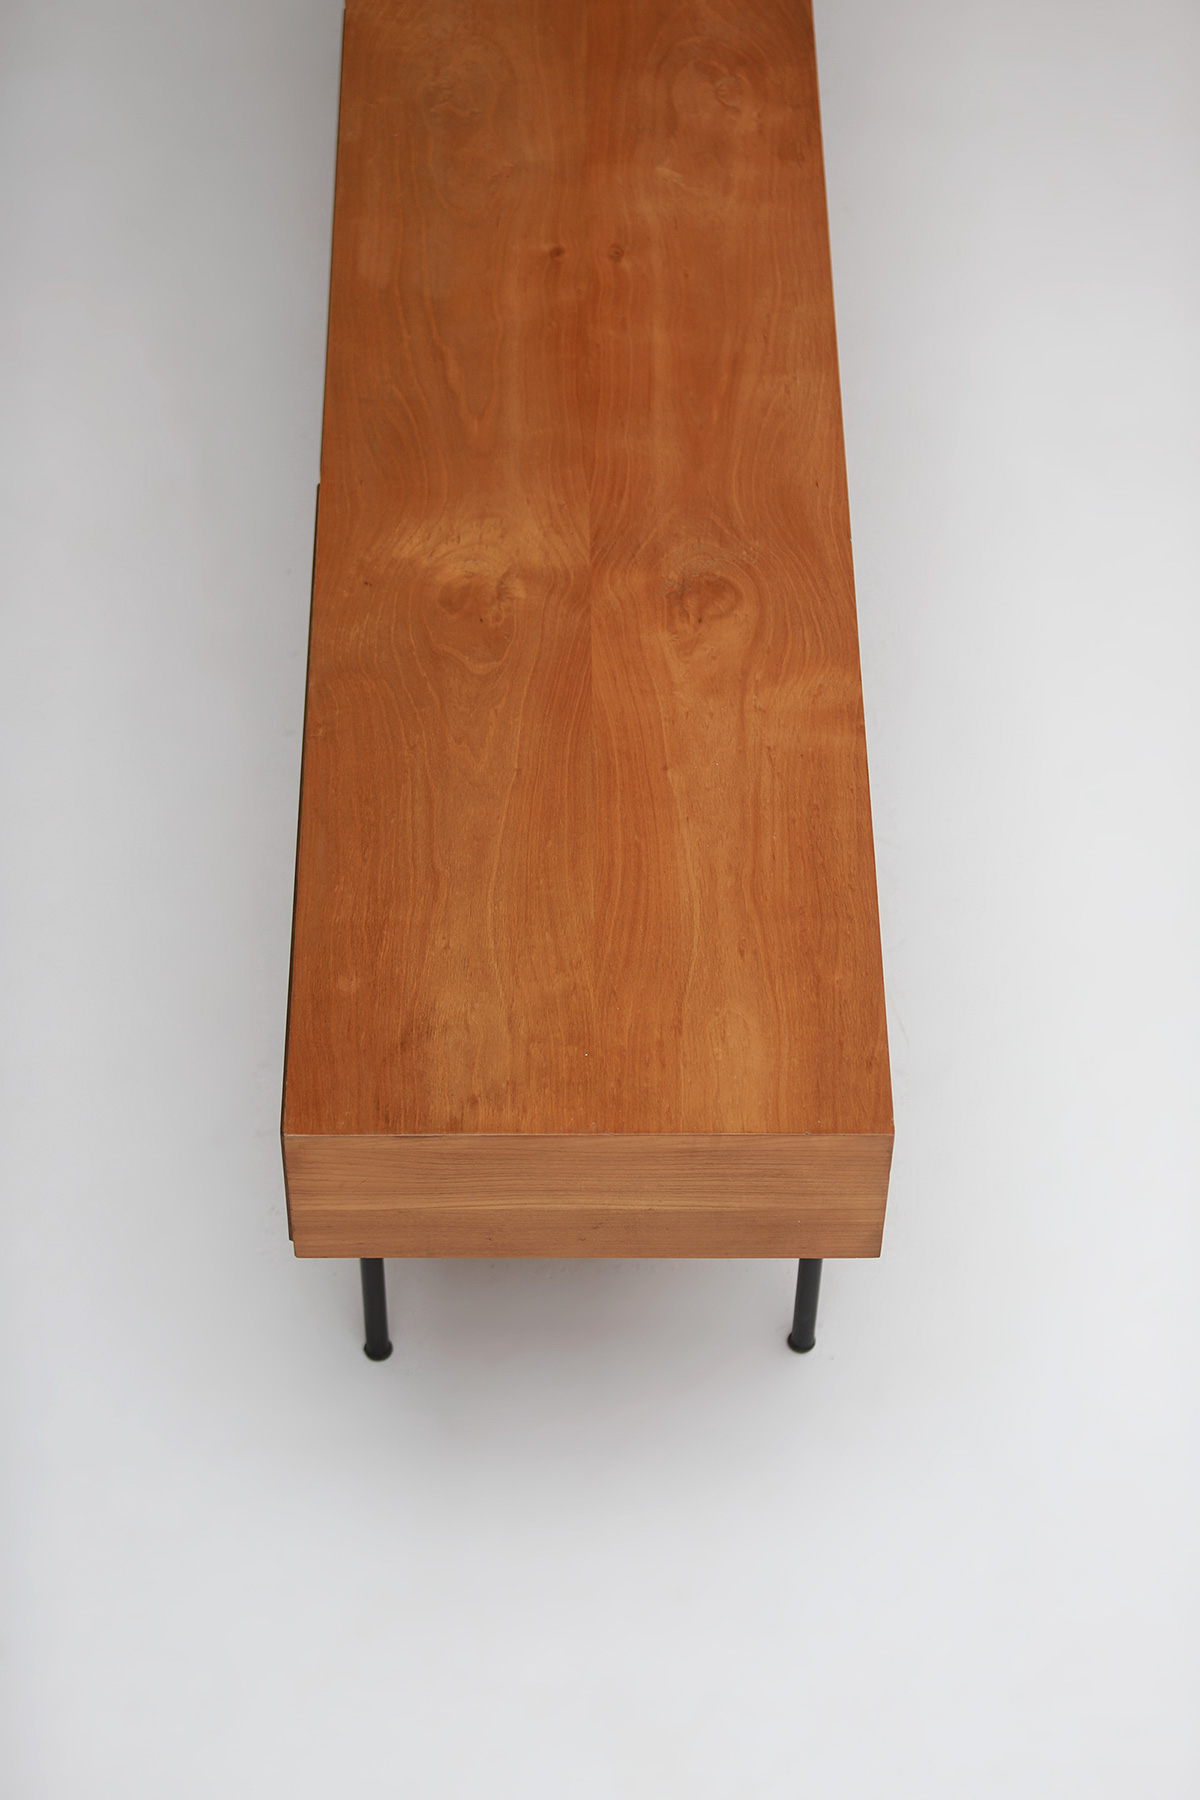 Long Low Sideboard  1960simage 11